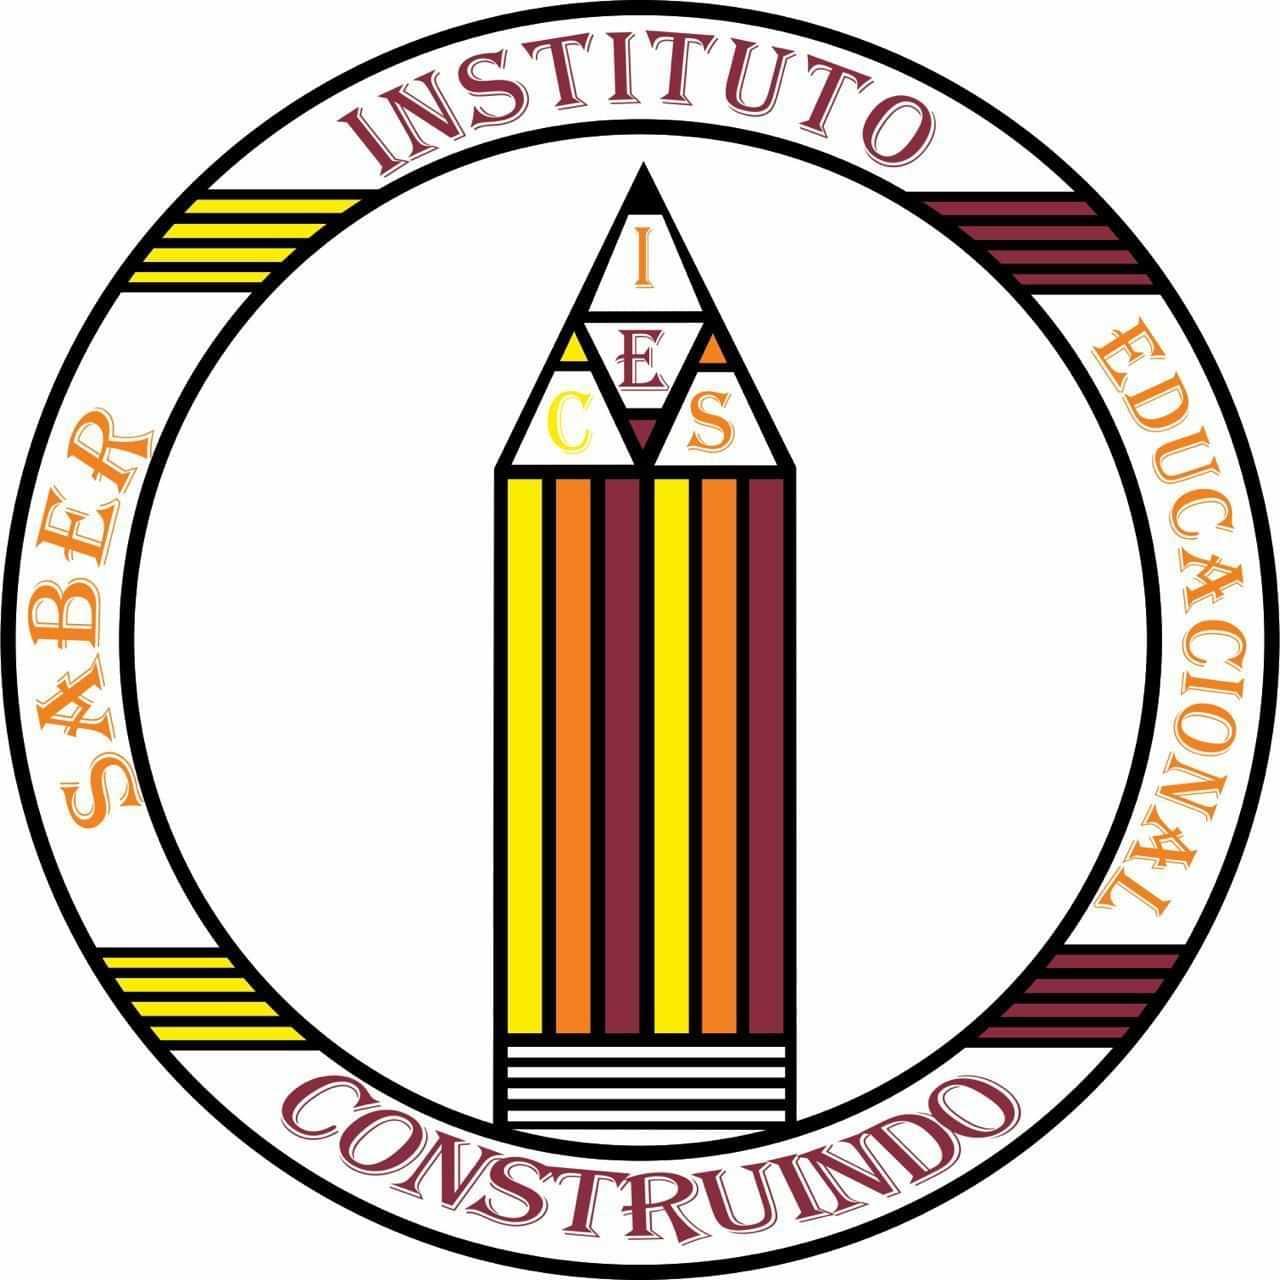 Instituto Educacional Construindo o Saber